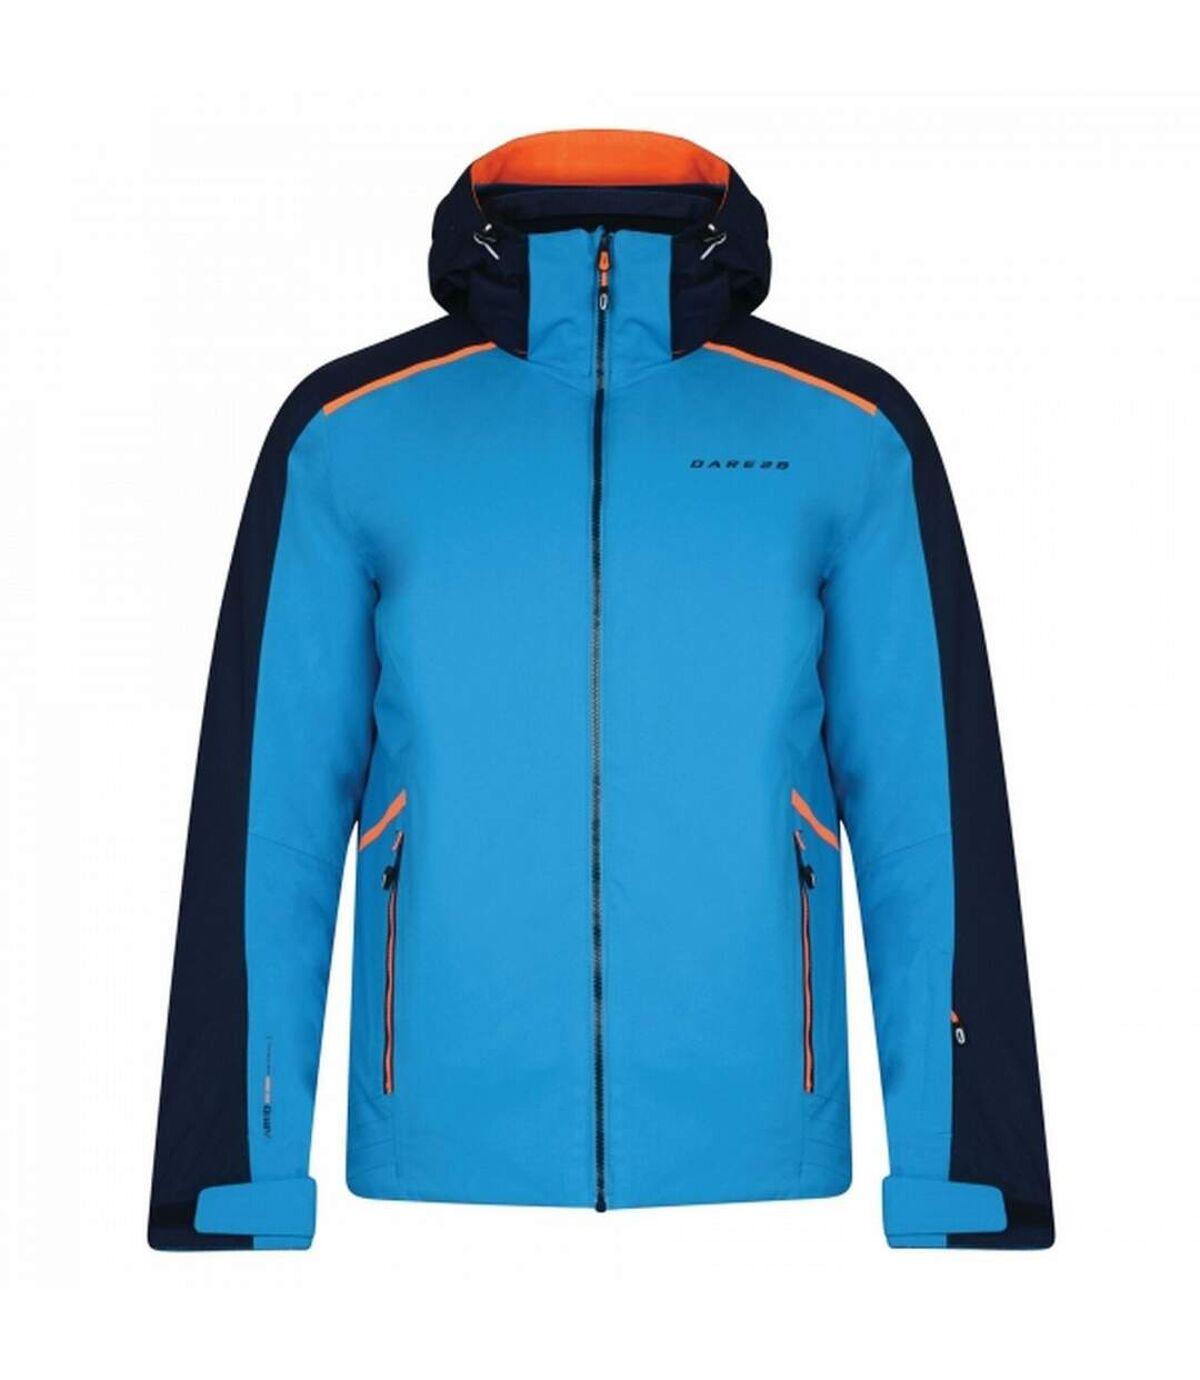 Dare2B Mens Educe Promo Jacket (Methyl Blue/Outer Space Blue) - UTRG3597